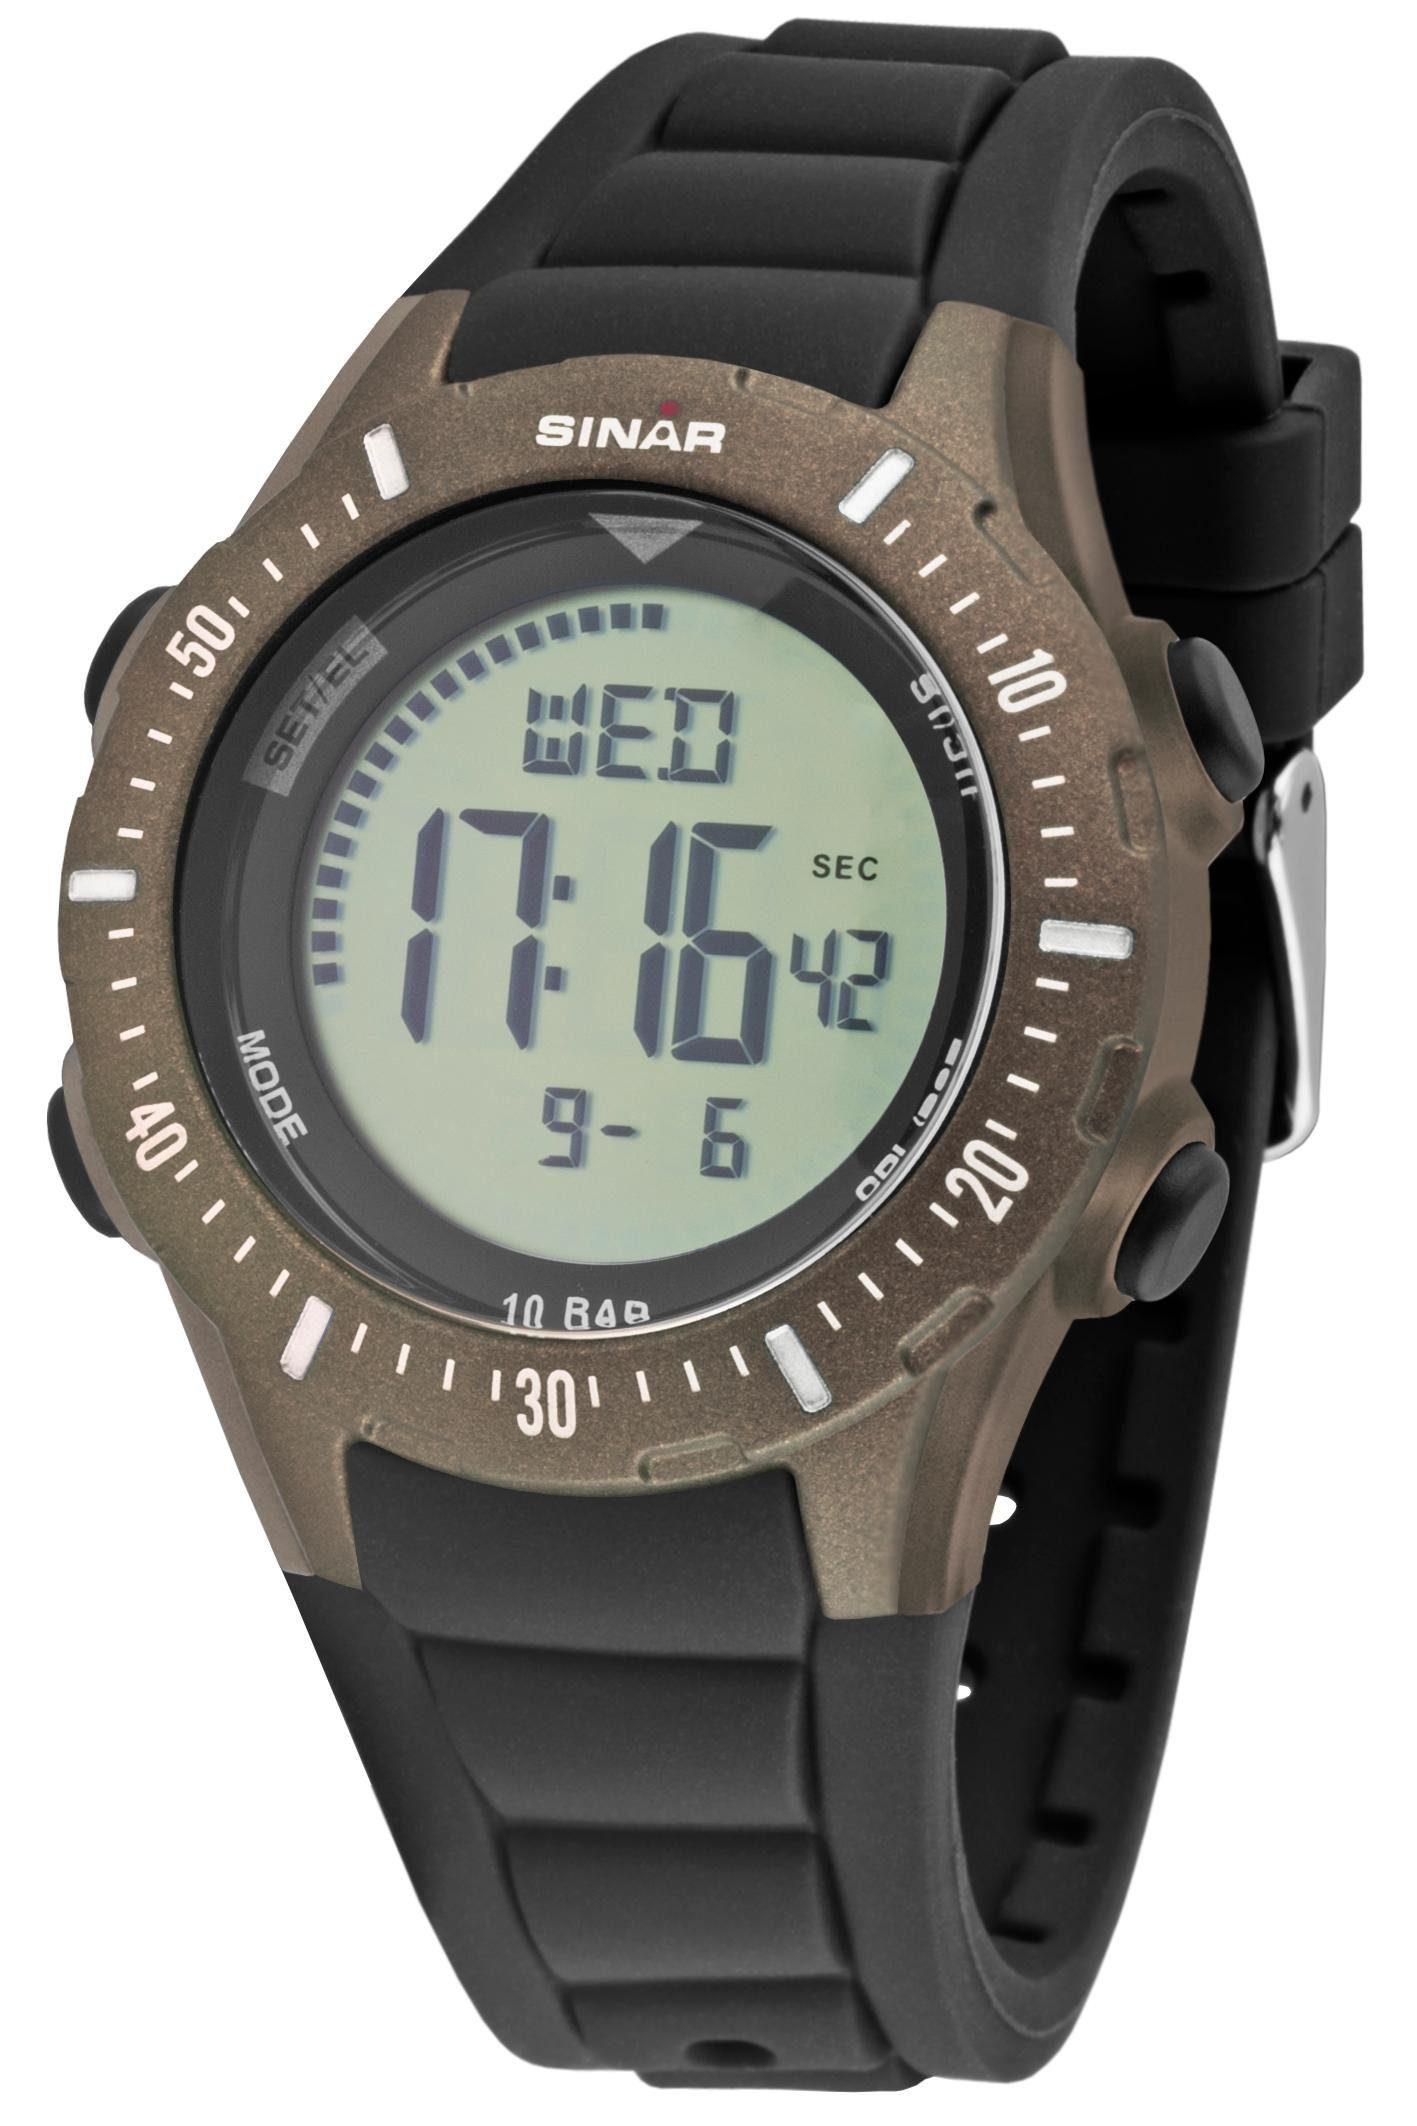 SINAR Chronograph »XR-12-5«